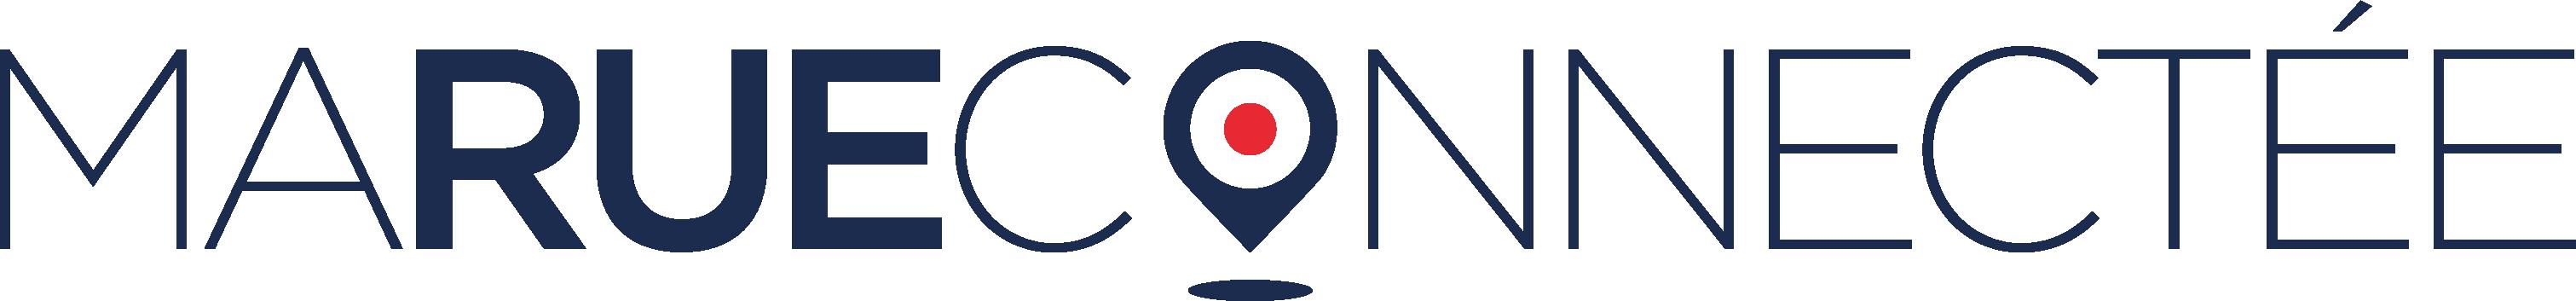 MA RUE CONNECTÉE_transparent logo